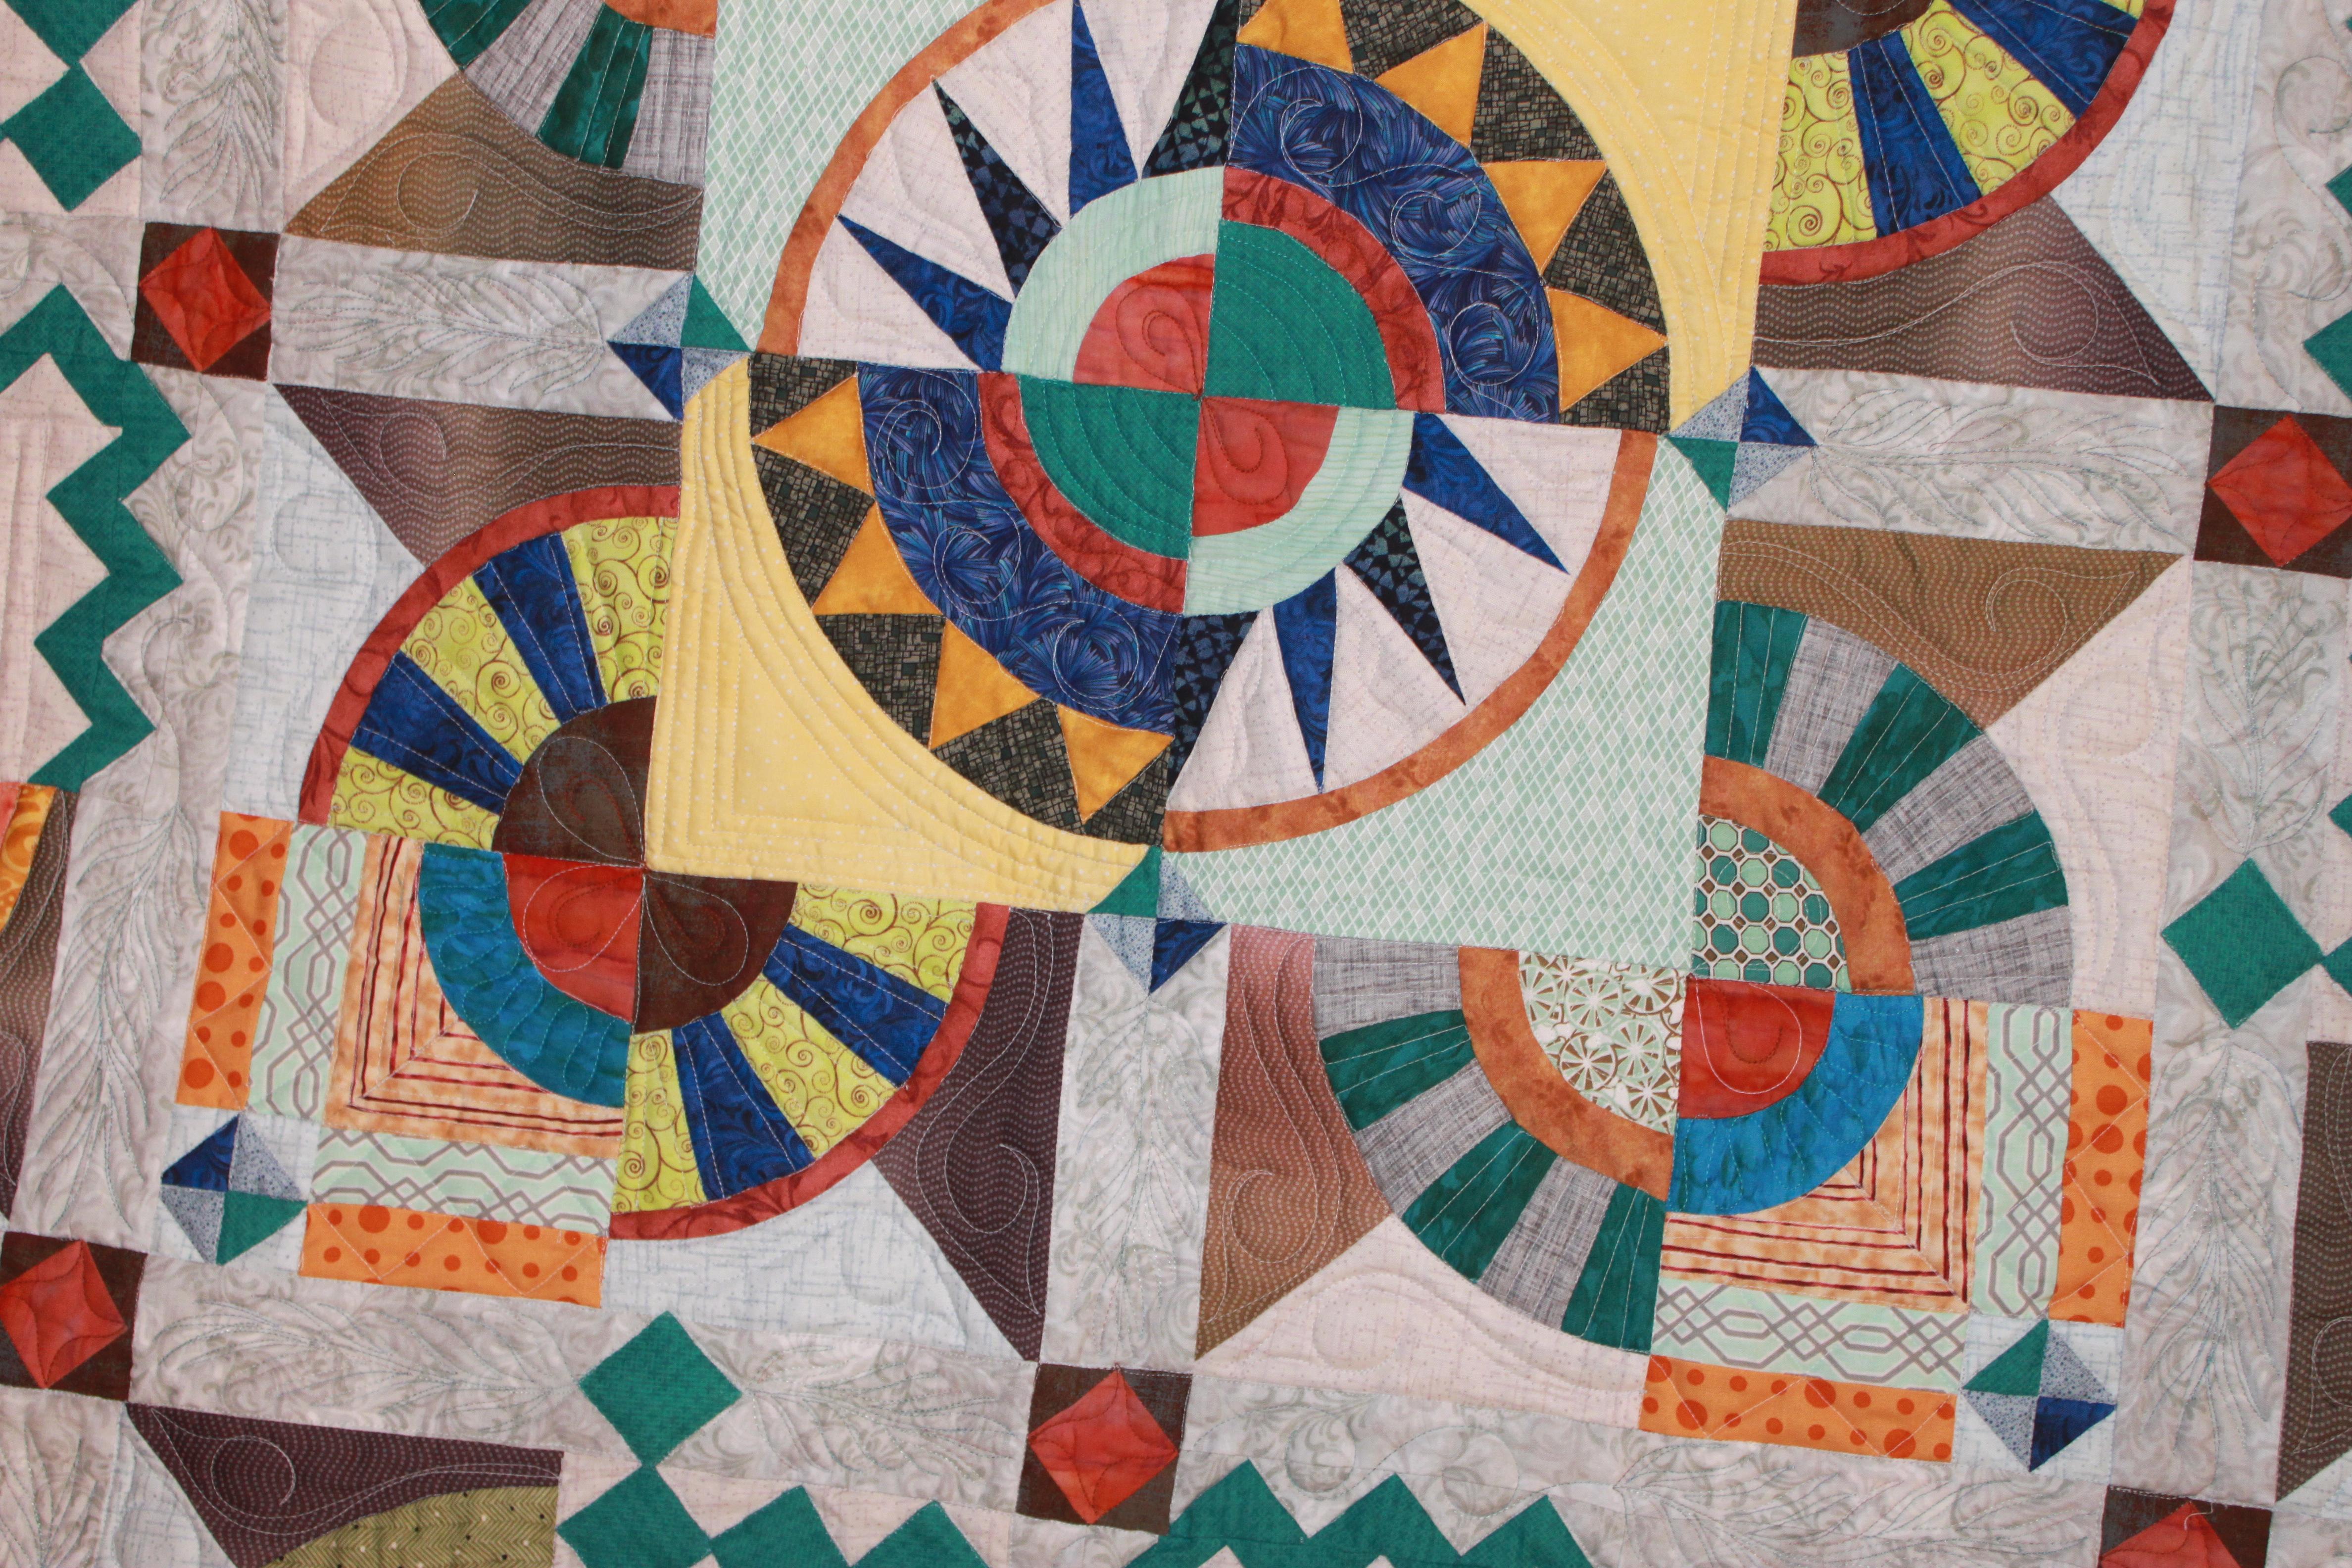 AinB016 quilt6 Engelman geometry-003